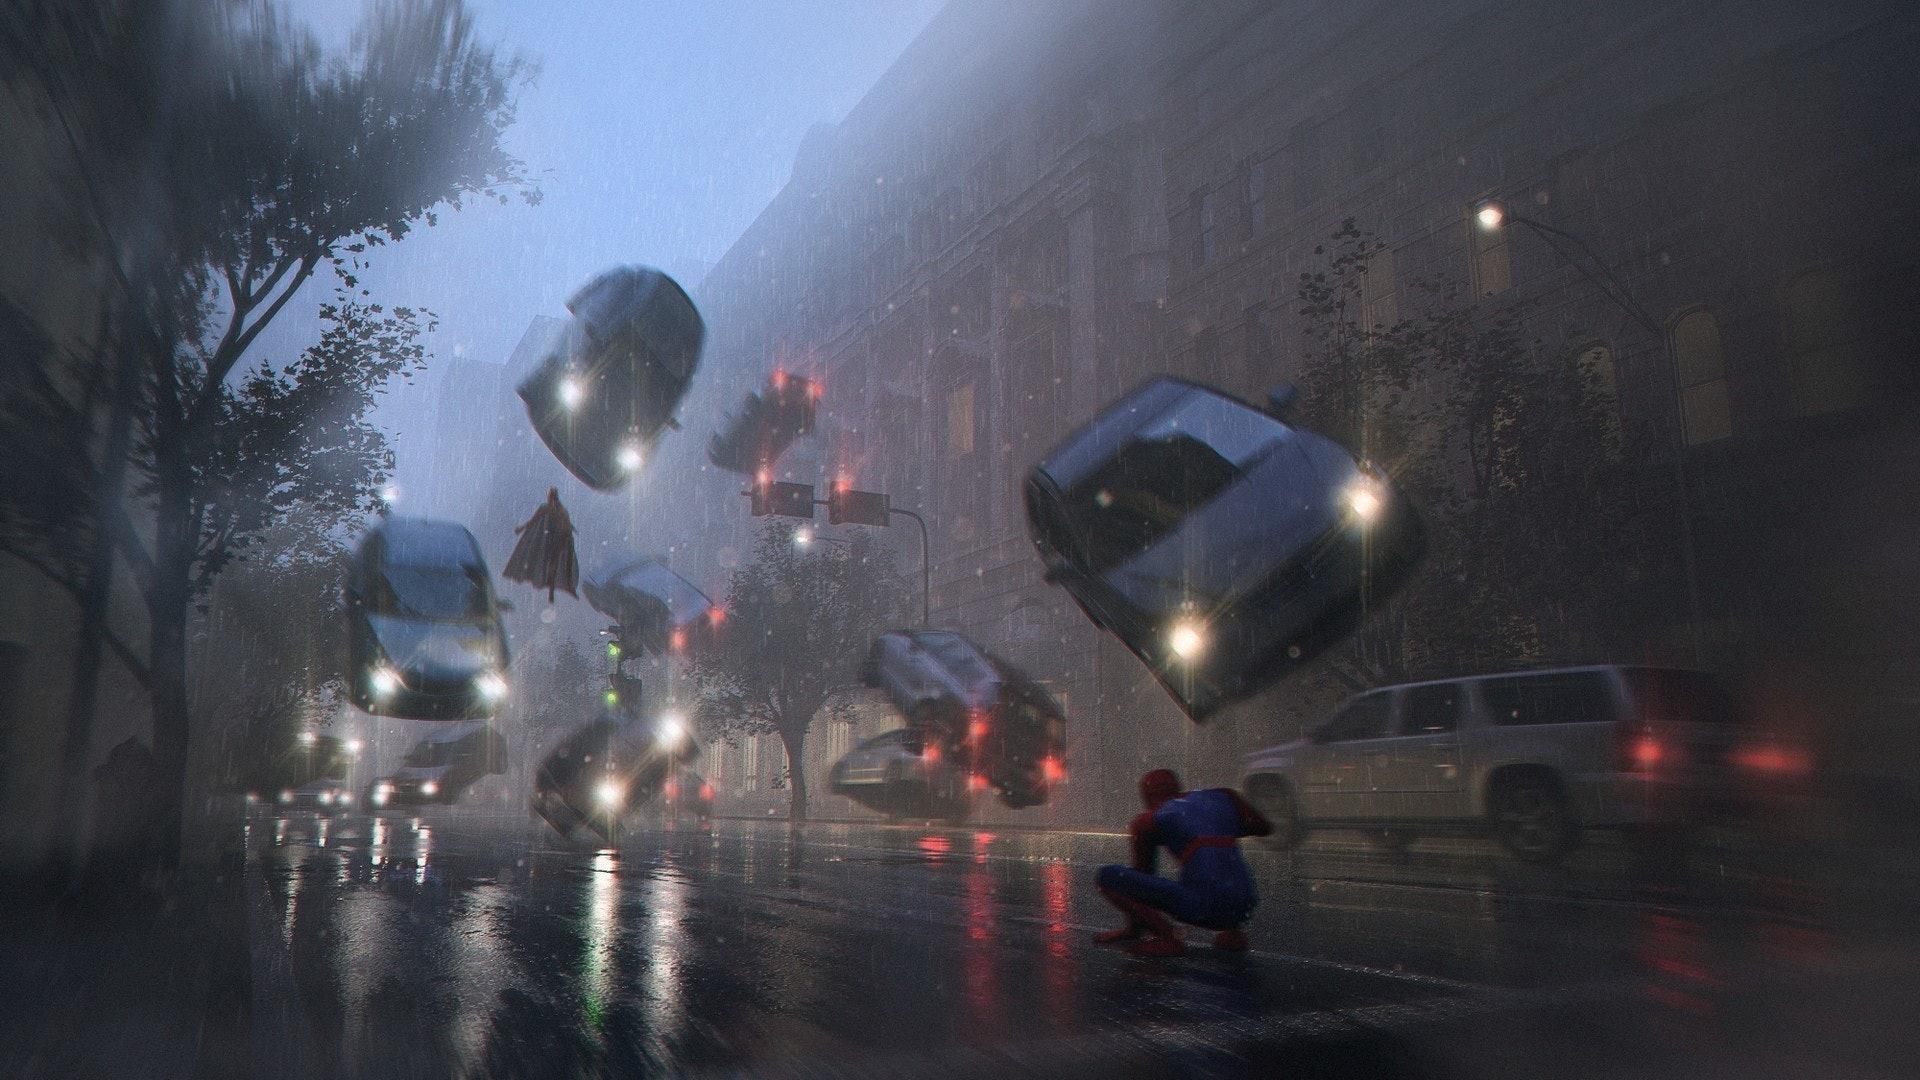 """Spiderman vs Magneto"" by Wai Kin Lam"